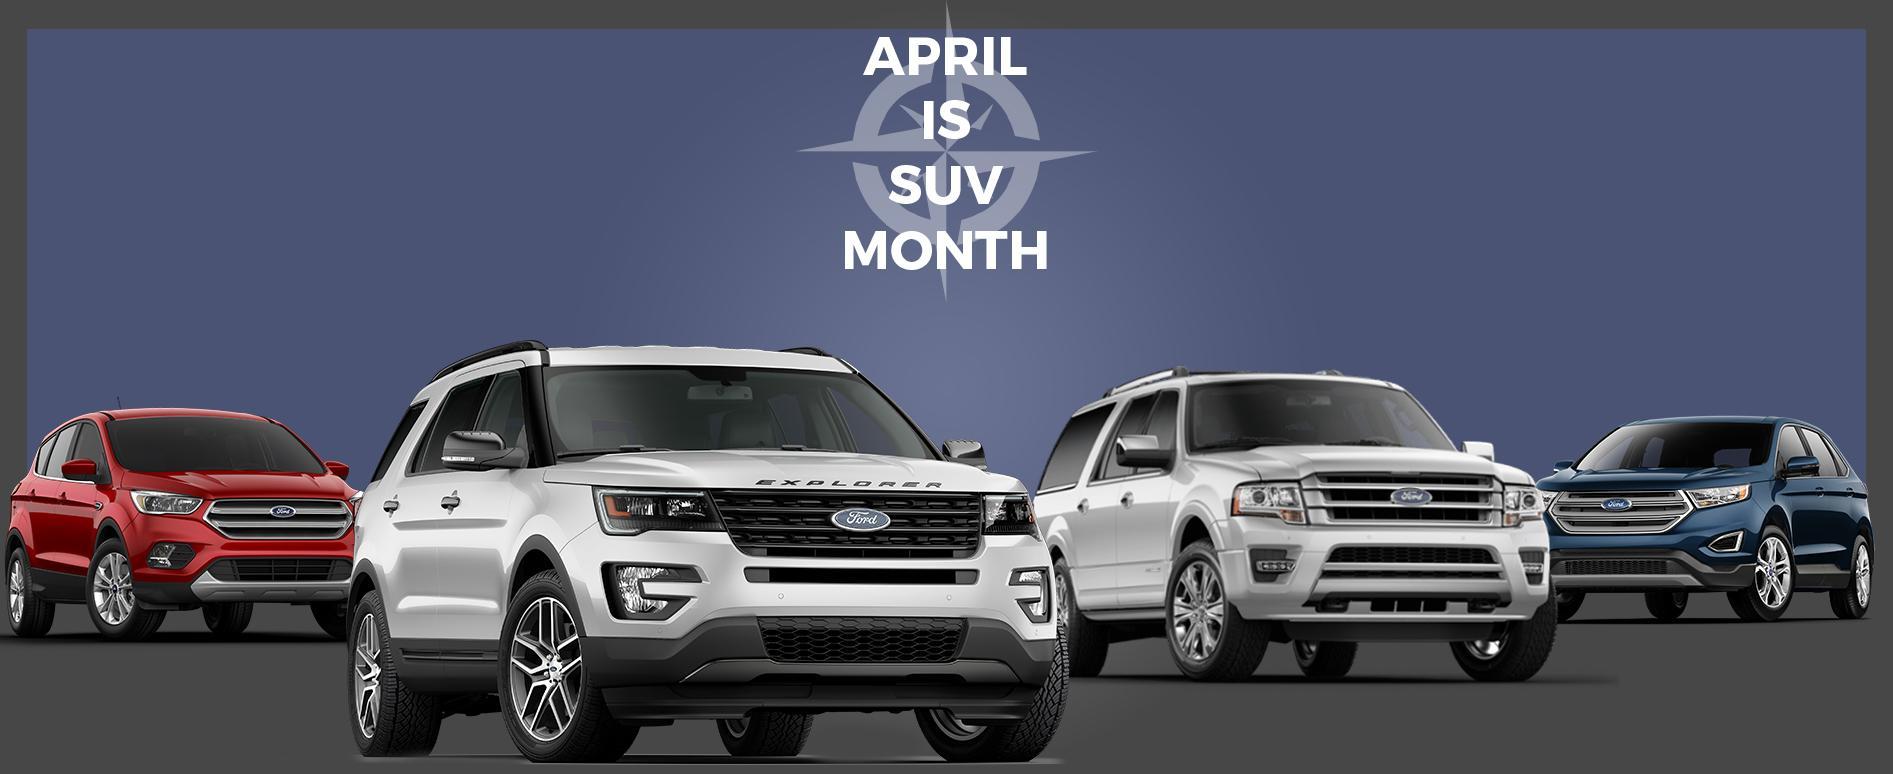 SUV month at Vegreville Ford